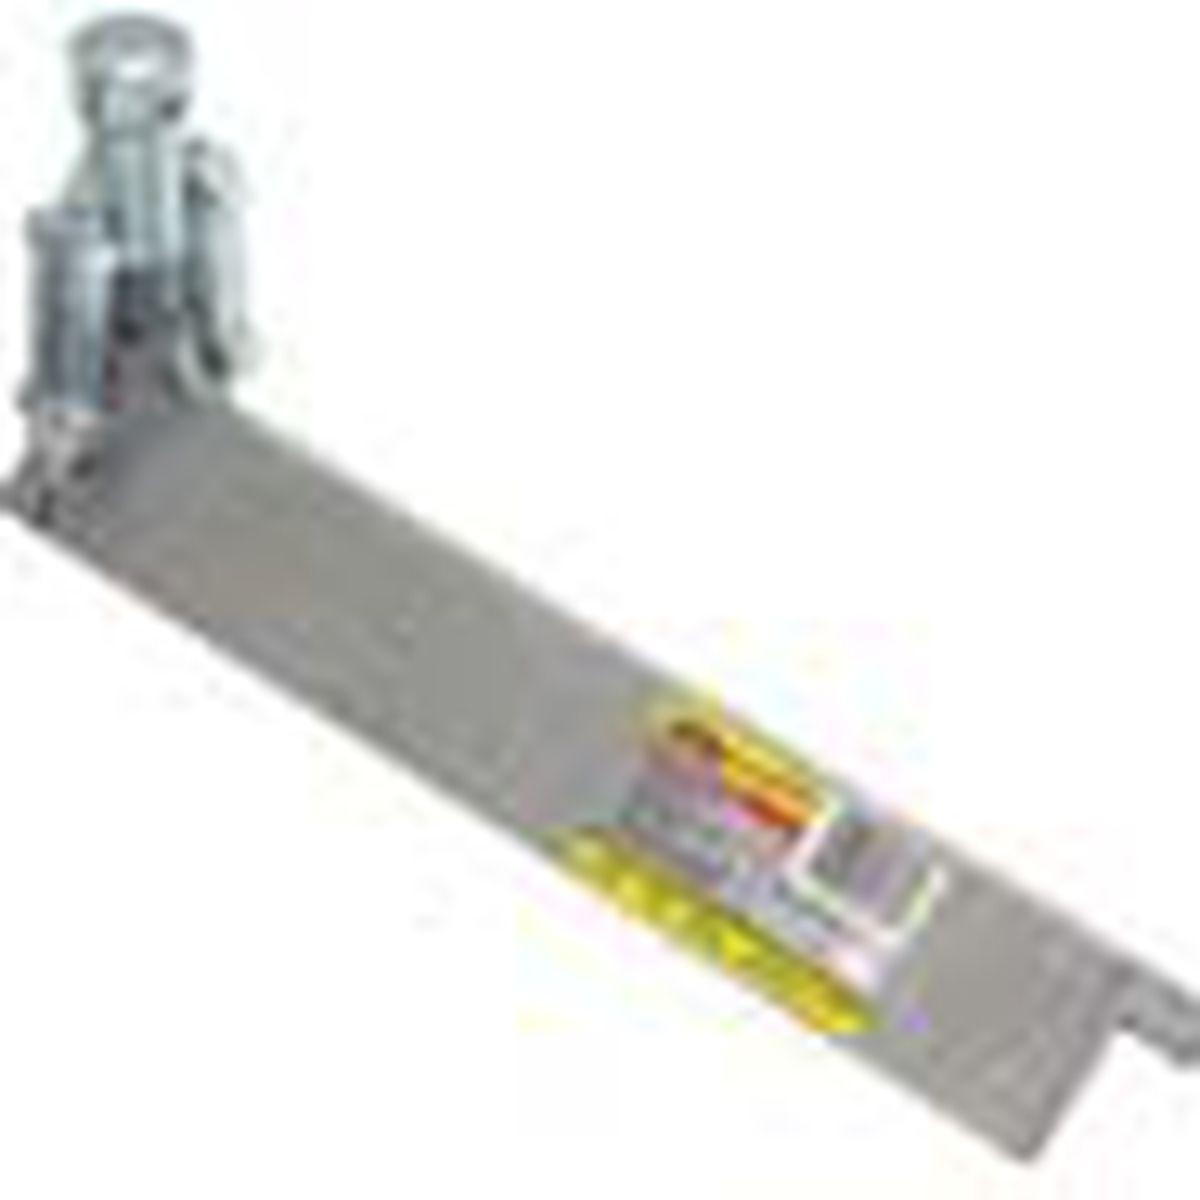 drywall corner clincher tool